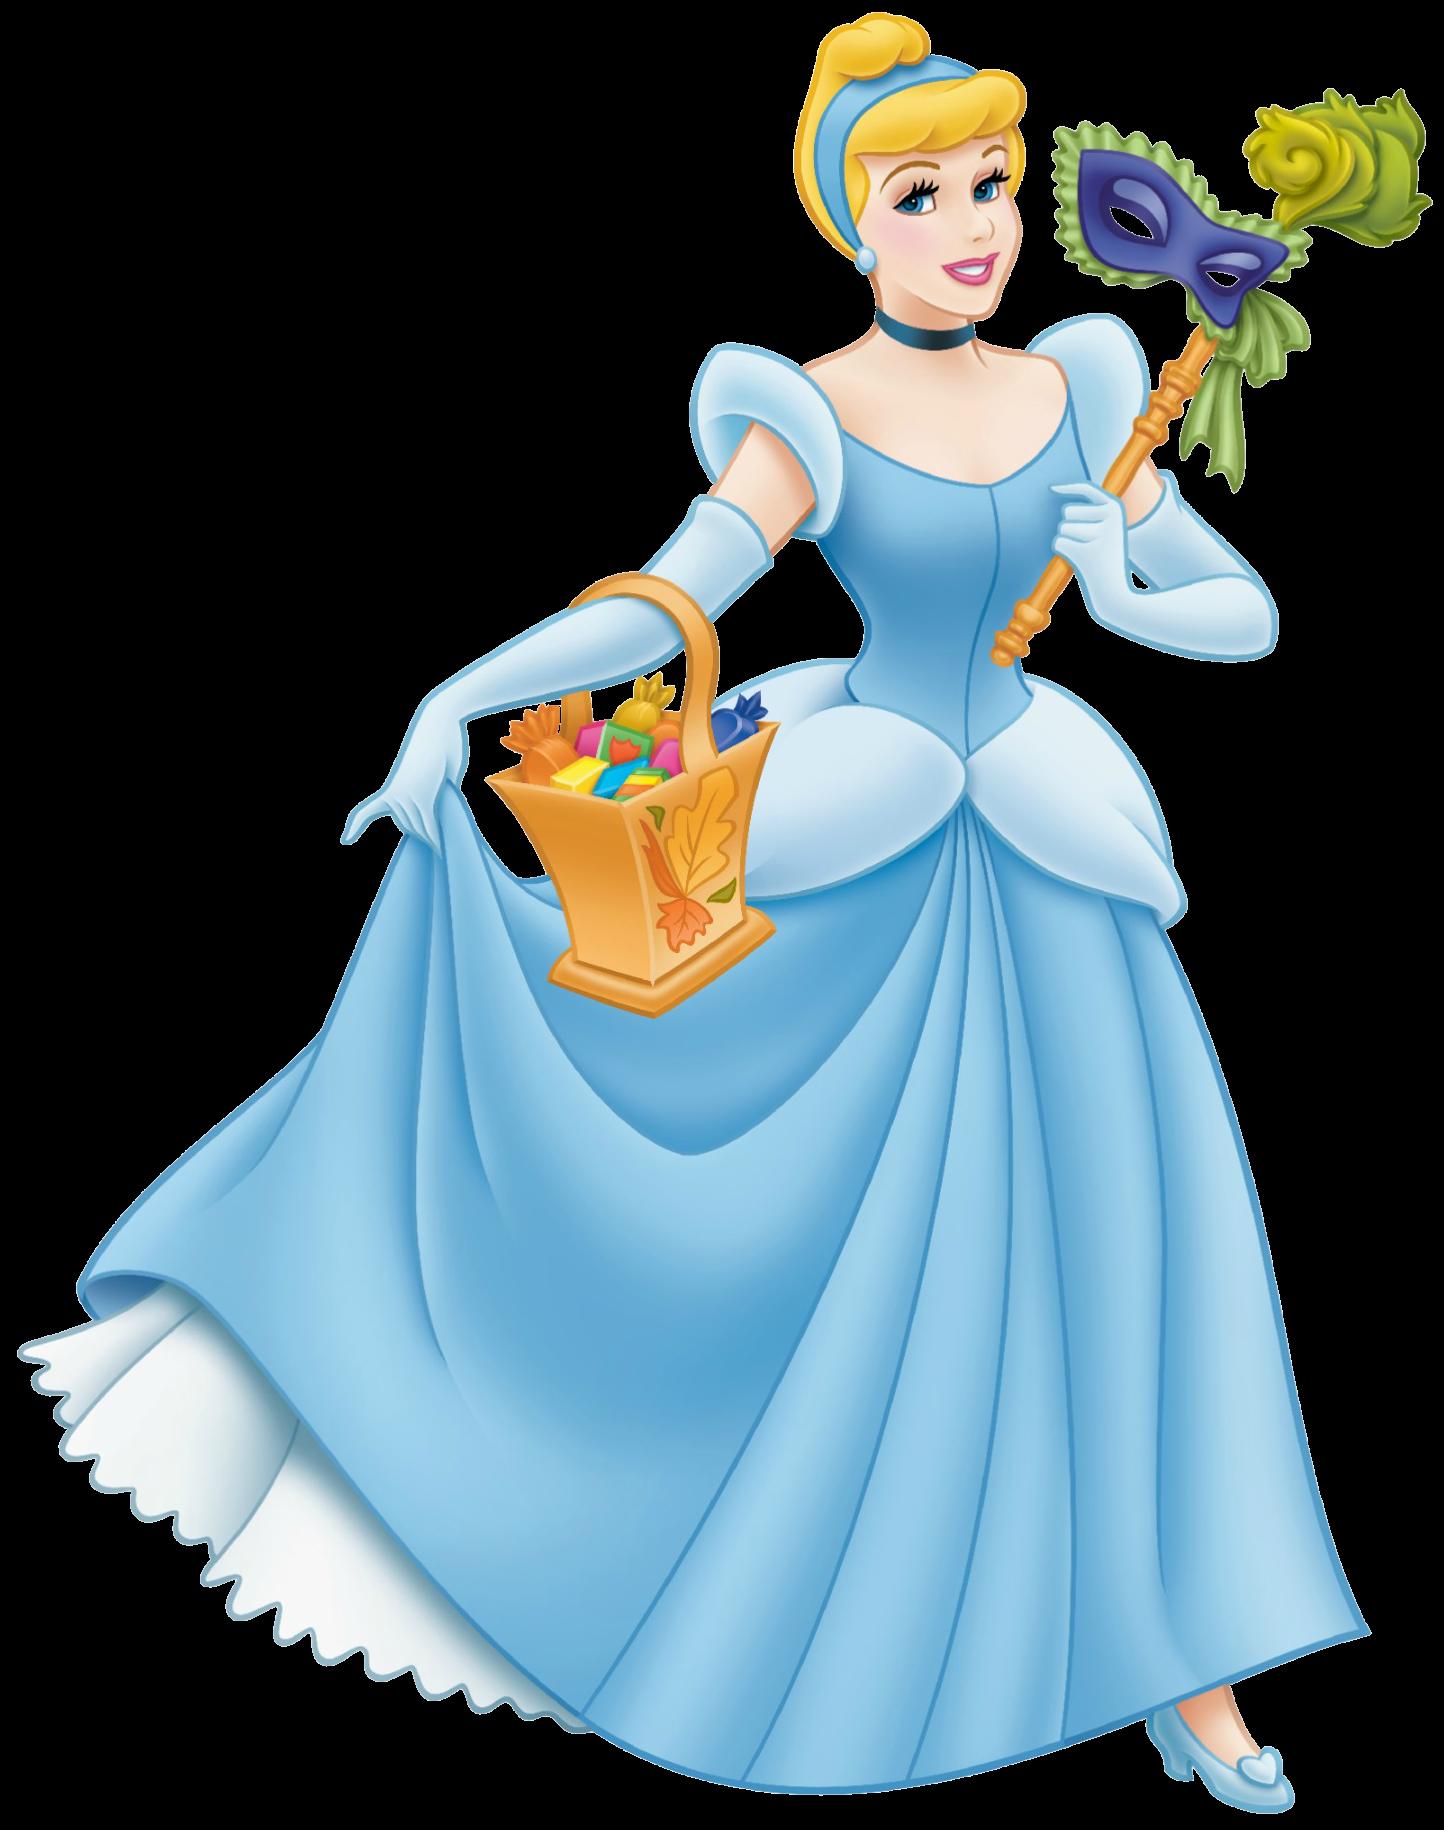 Cinderella clipart christmas. R sultats de recherche